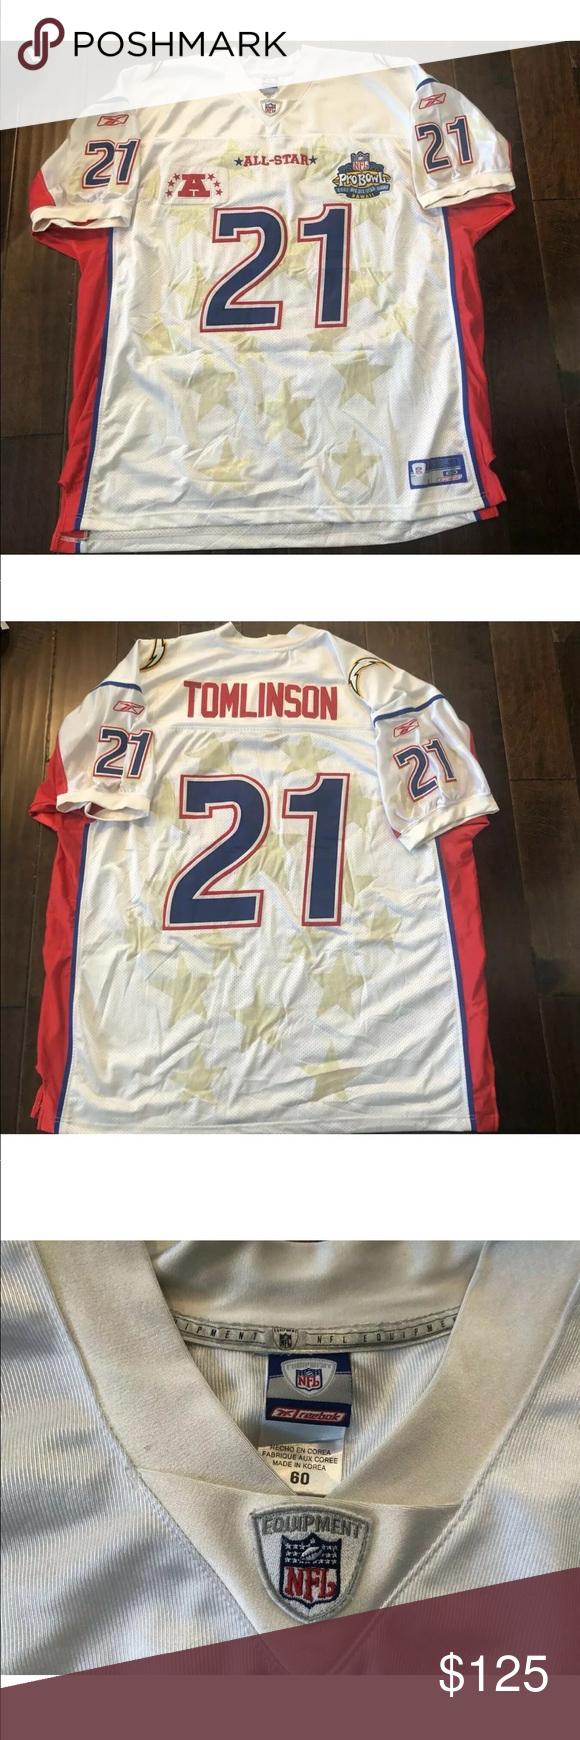 finest selection 857eb fe462 LaDainian Tomlinson Chargers 2003 Pro Bowl Jersey LaDainian ...